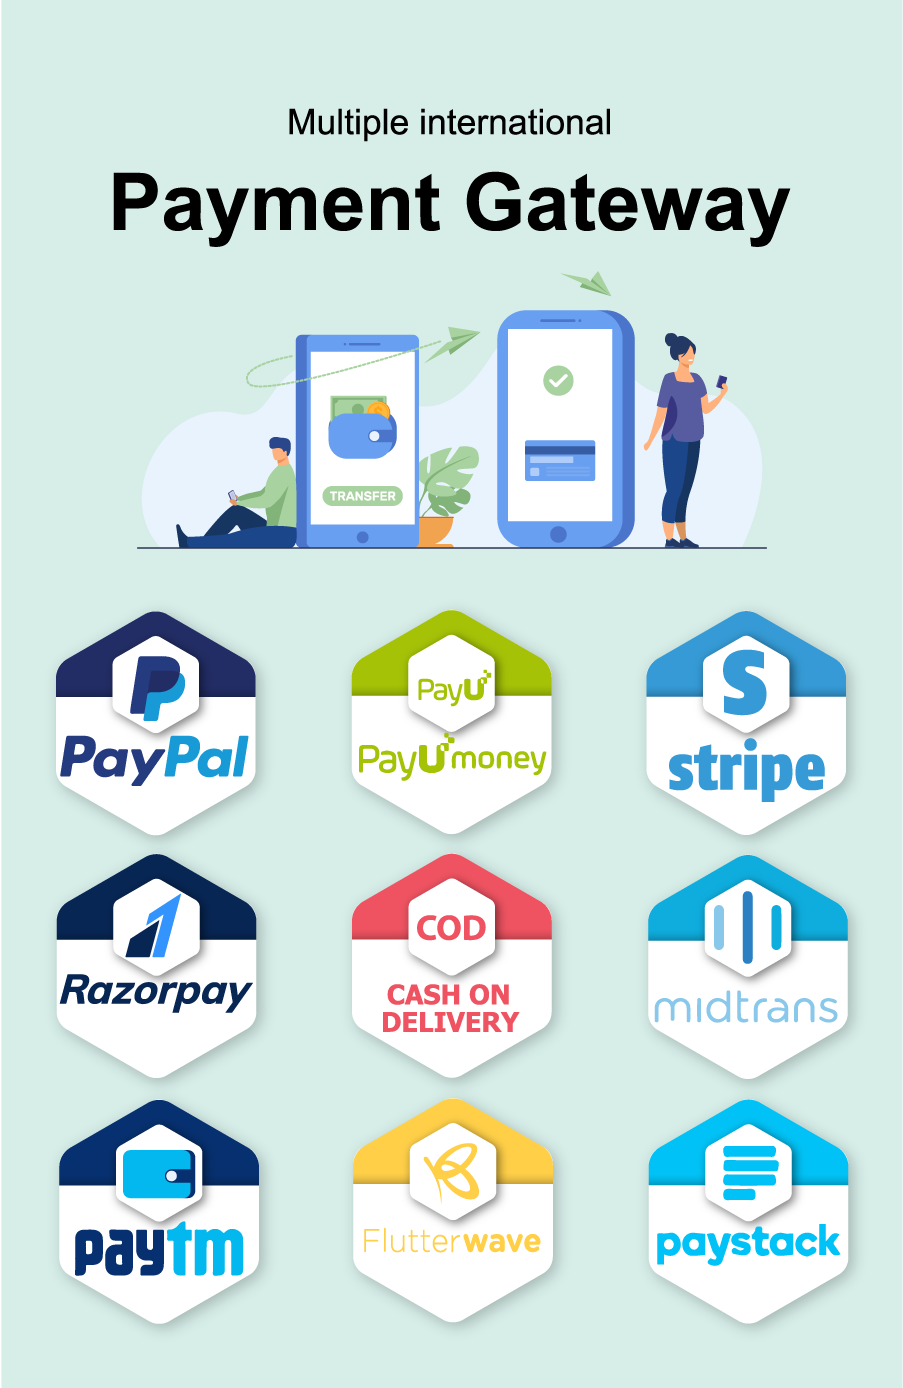 eCart Web - Ecommerce/Store Full Website - 6